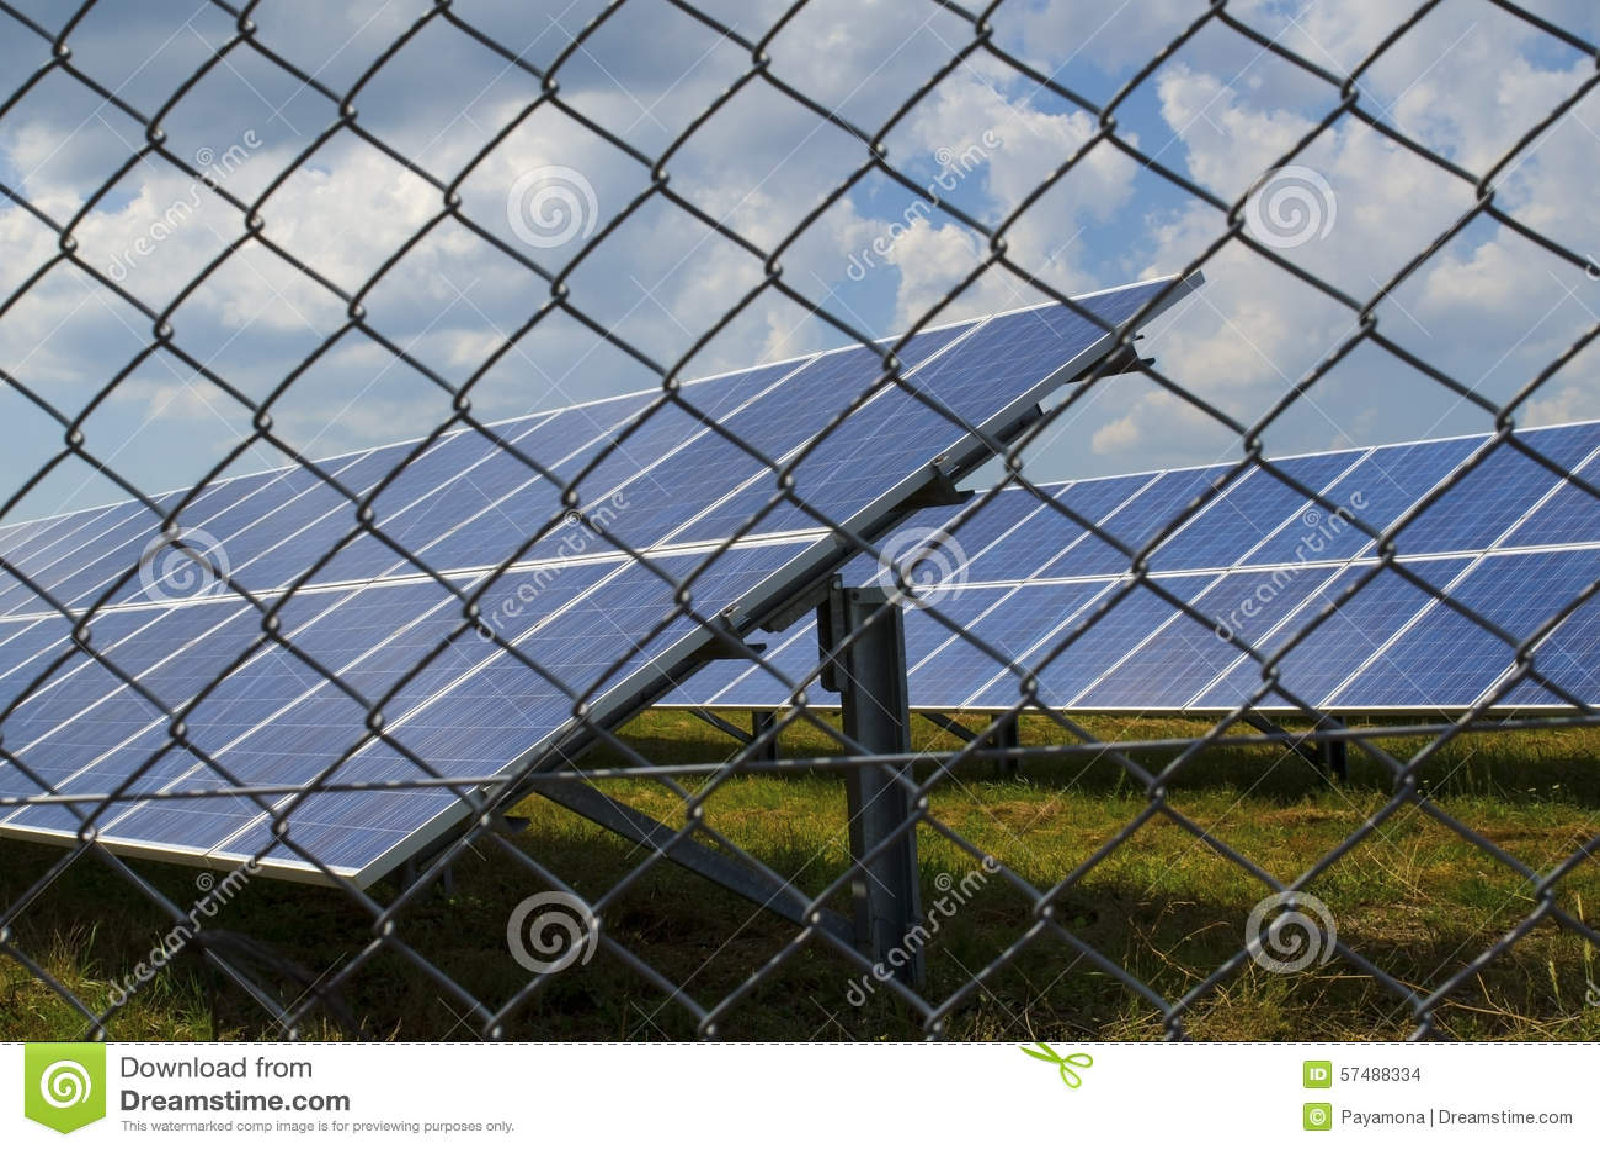 Sonnenkollektor Eingezäunt In Einem Rostigen Draht Stockfoto ...